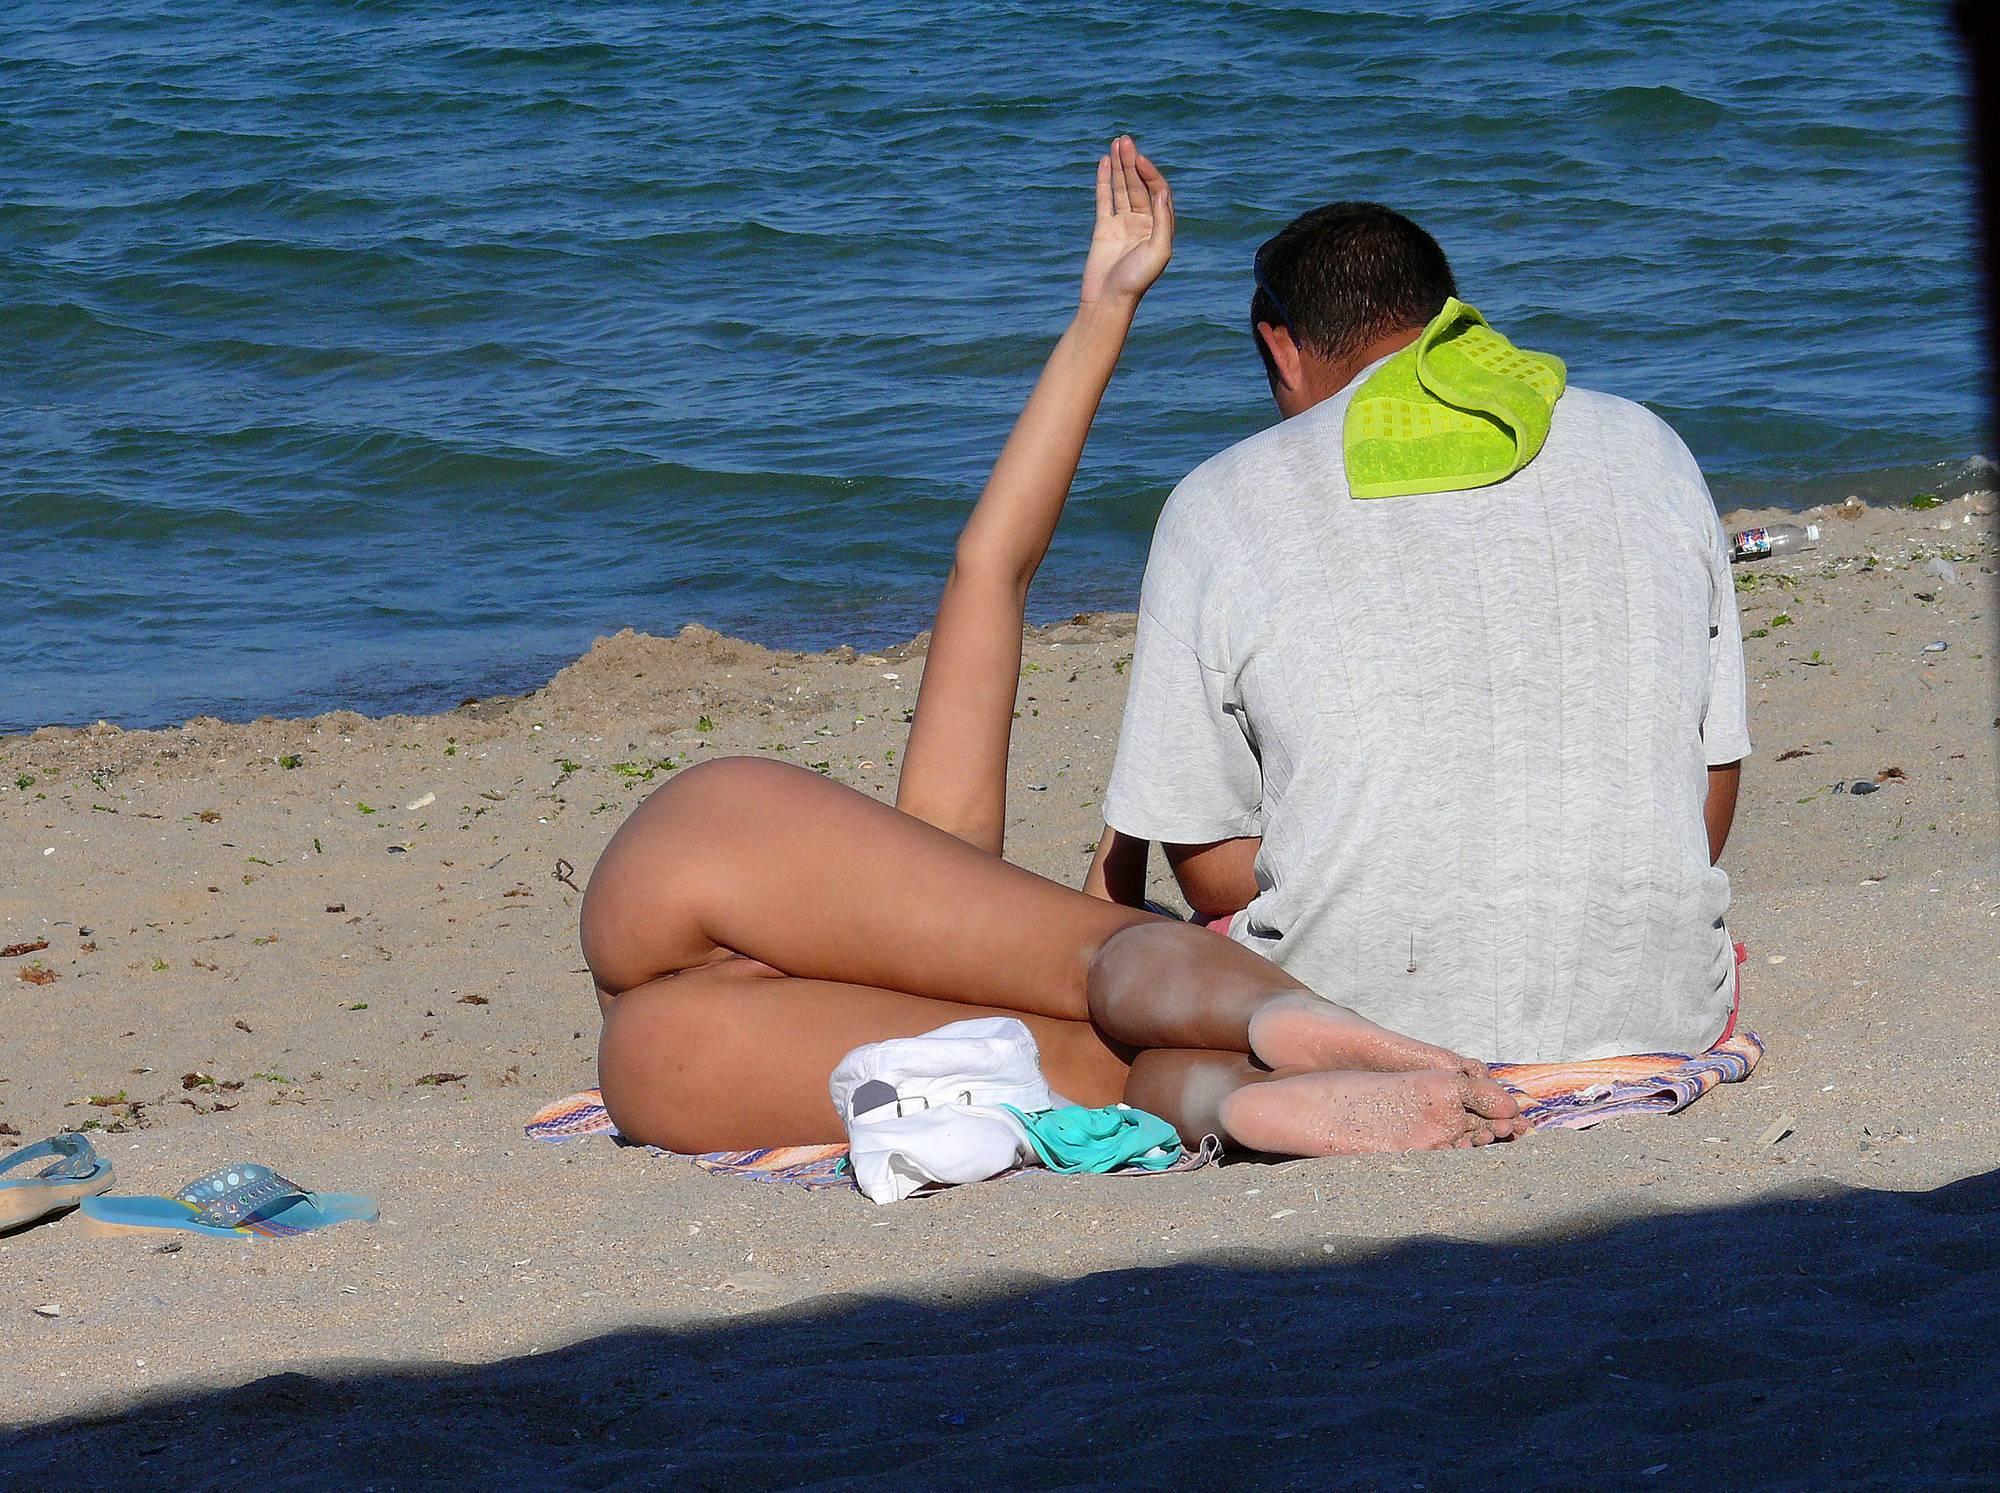 Romanian Beach Voyeur - 1